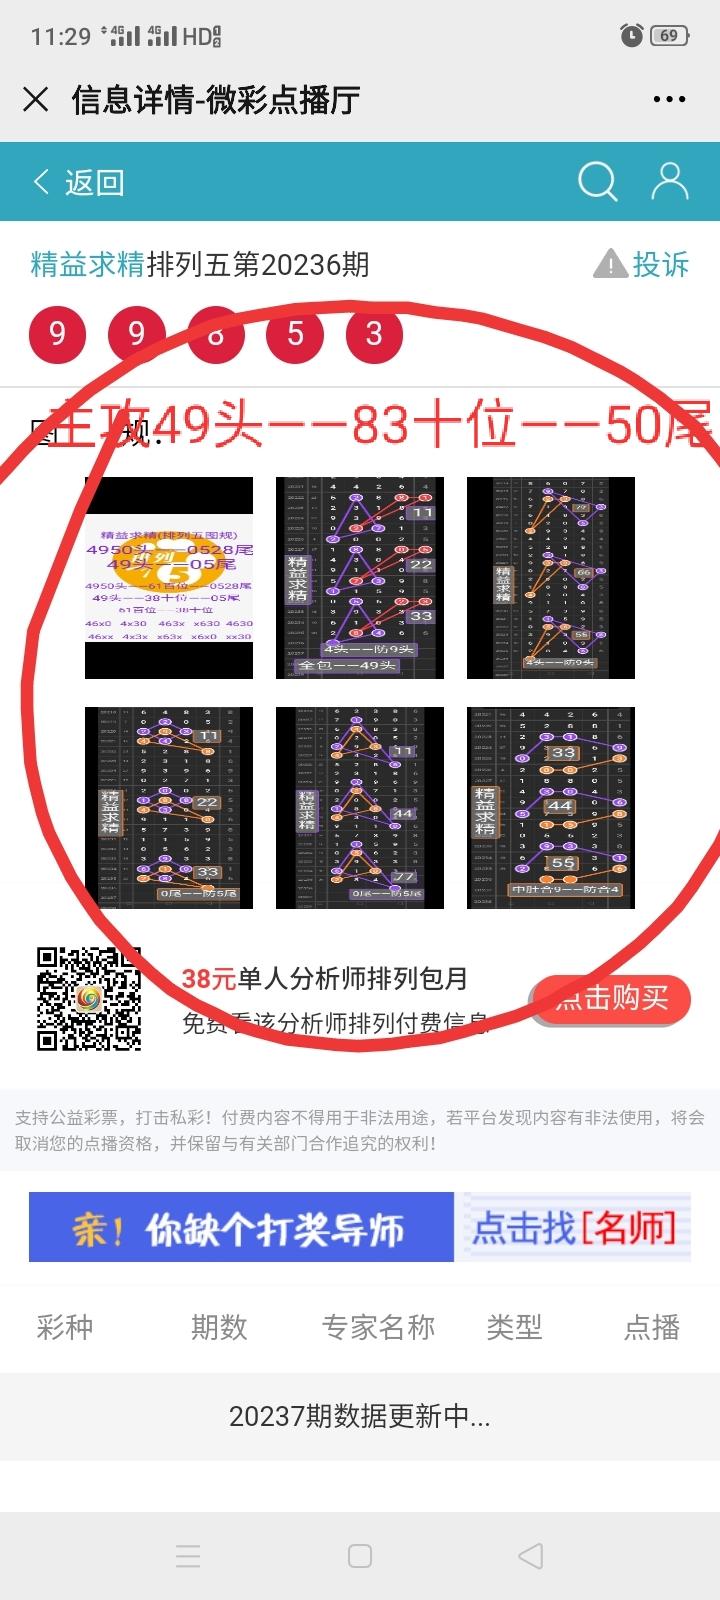 IMG_20201017_112956.jpg